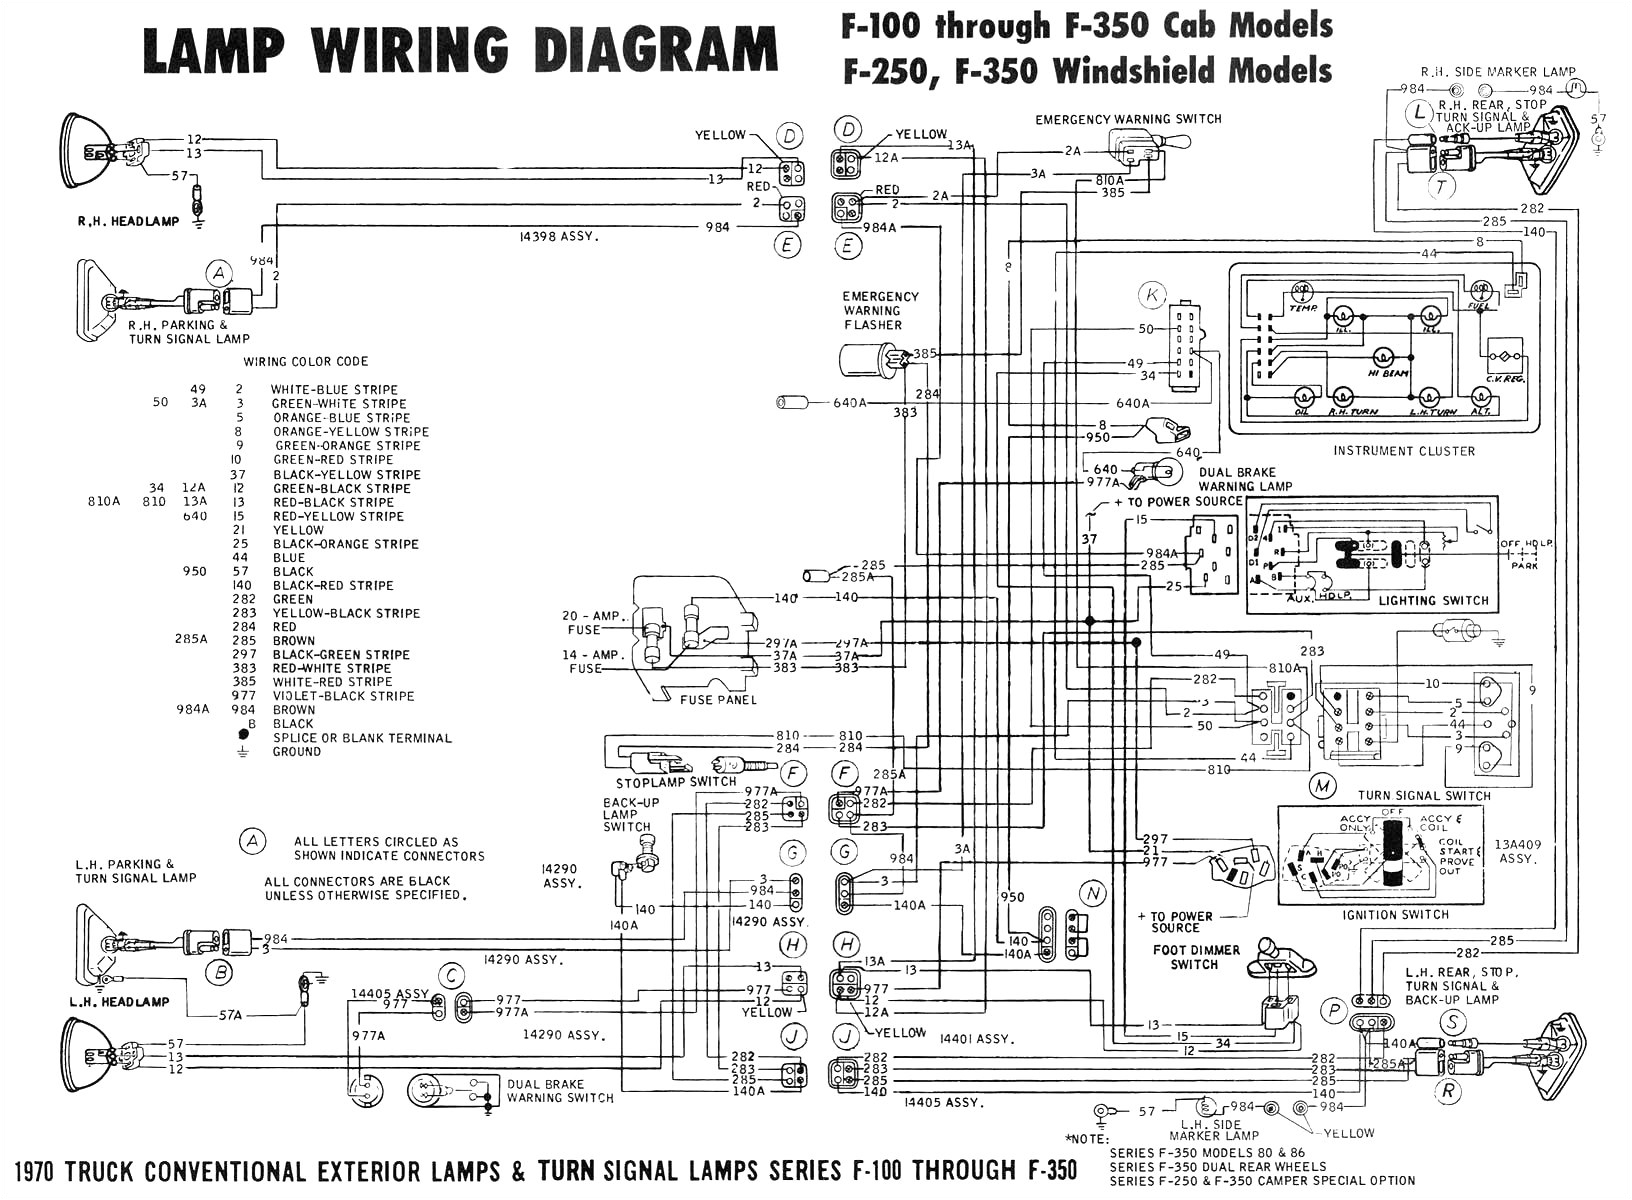 tac 48 refrigeration wiring diagram wiring diagram split tac 48 refrigeration wiring diagram